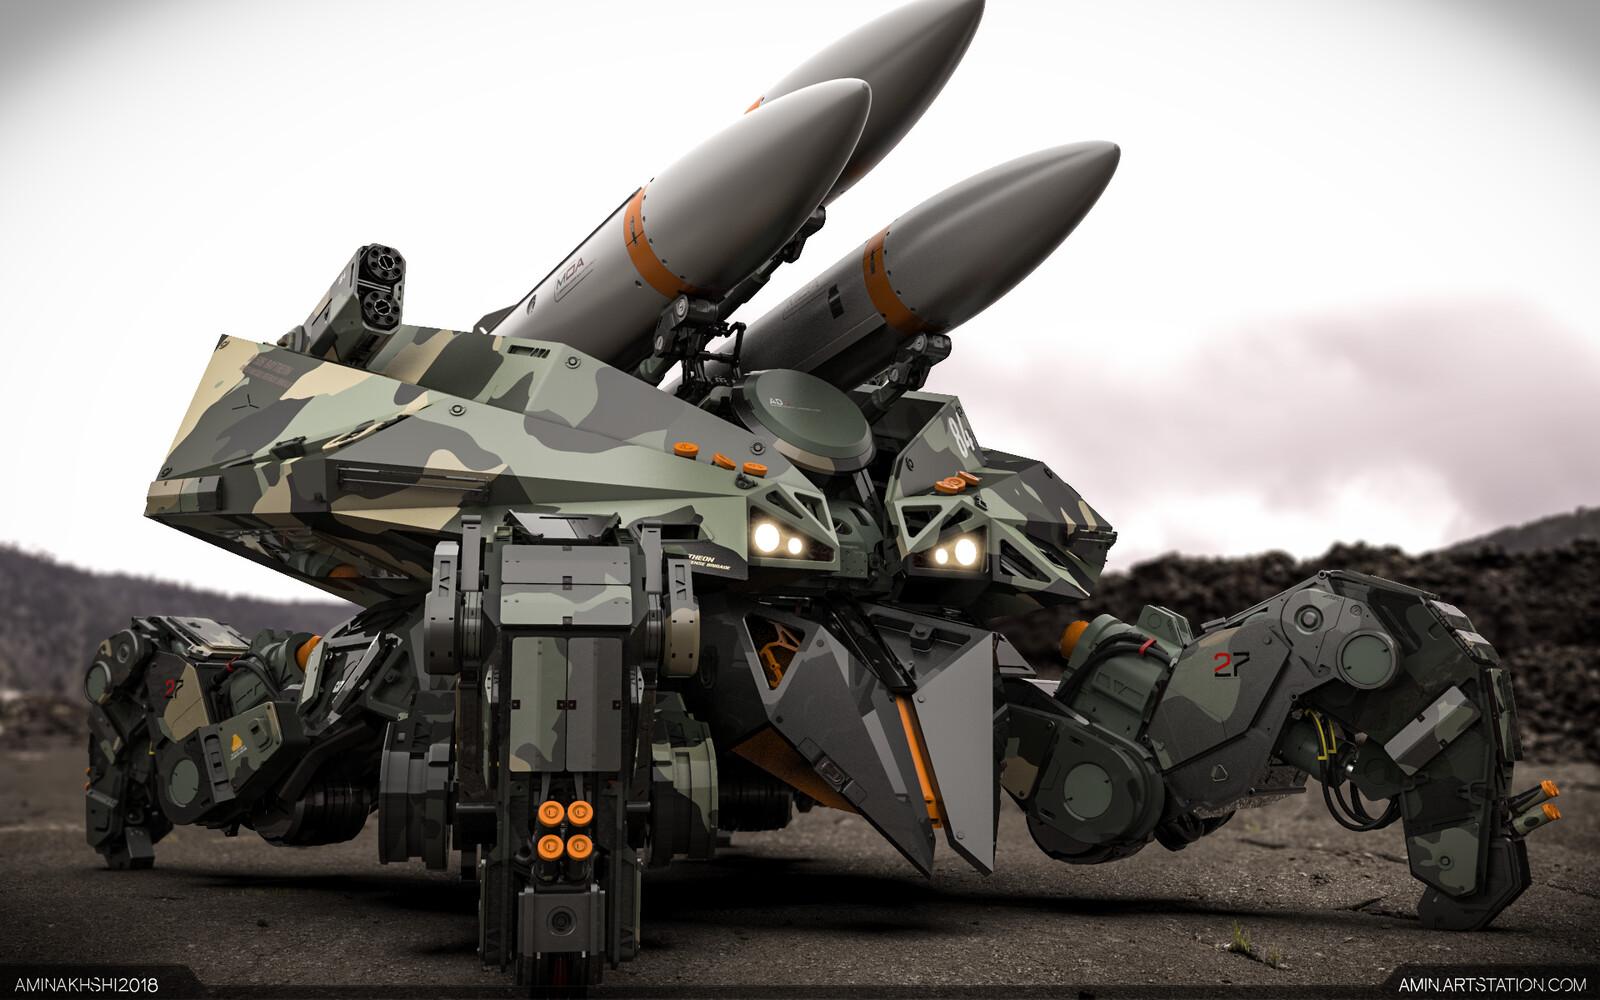 M 506 Raytheon, 100th Missile Defense Brigade